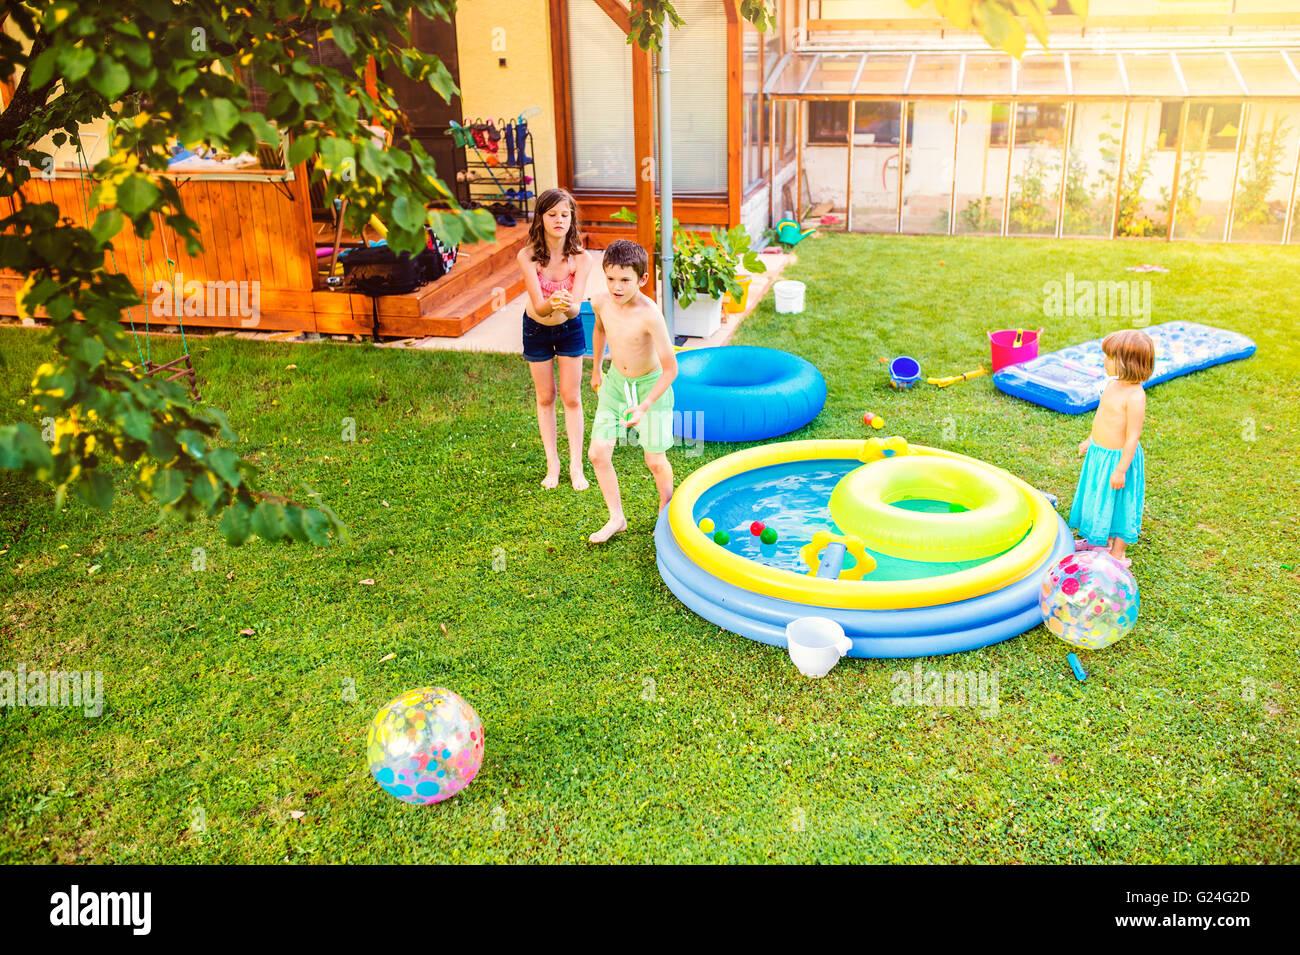 Boy splashing girls with water gun in the garden - Stock Image